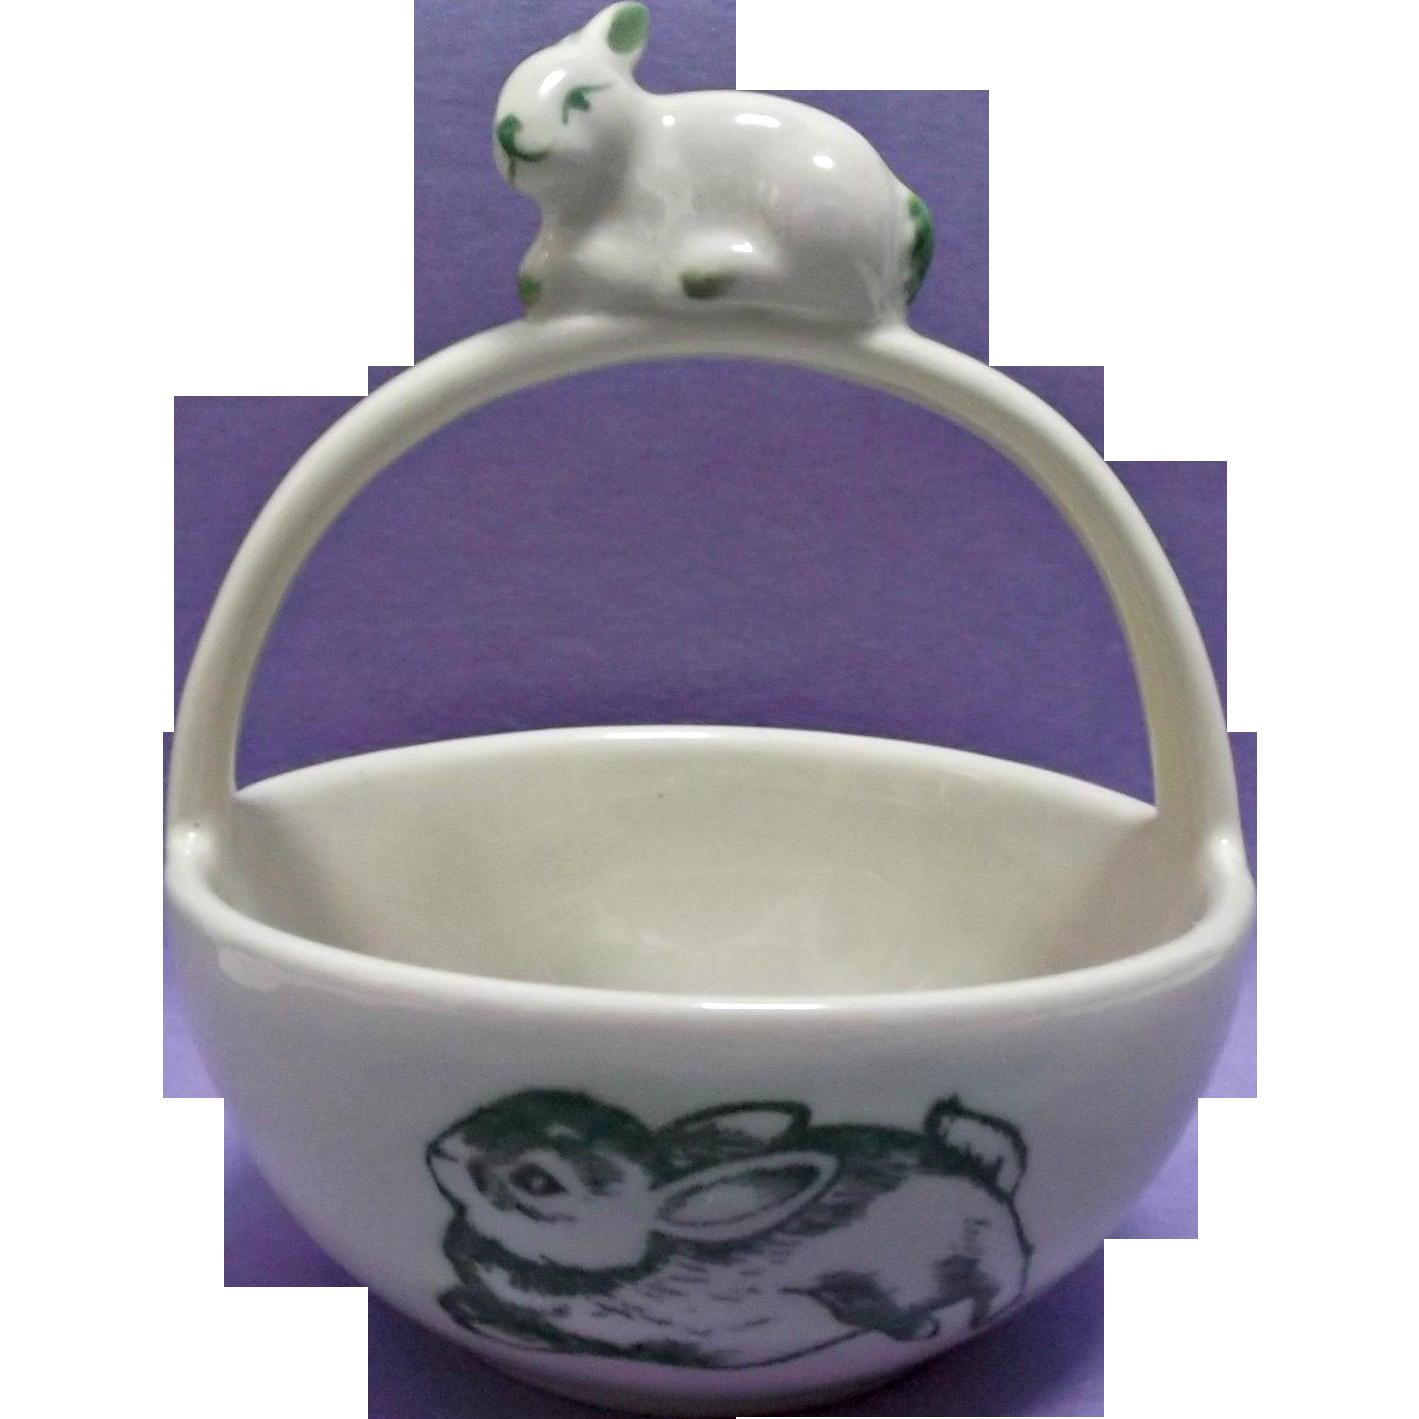 Andrea by Sadek Bunny Toile Basket Ceramic China Easter